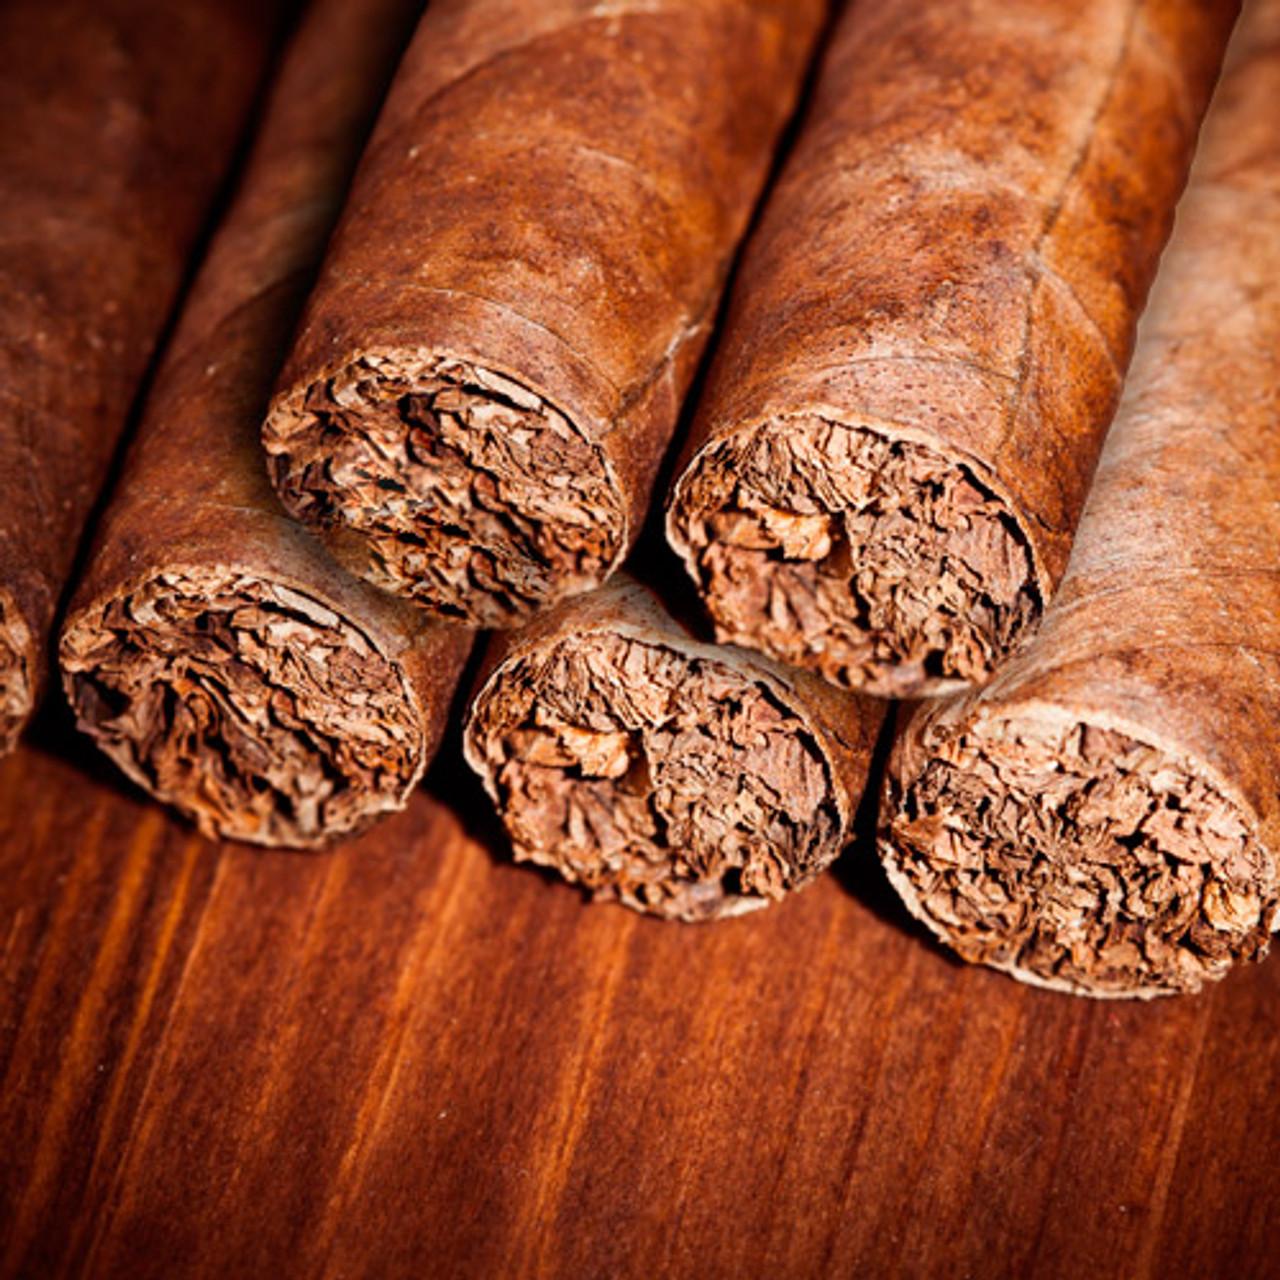 Cigar Samplers Rocky Patel Vintage Shipper Cigars (15 Packs of 4 (60 Total))